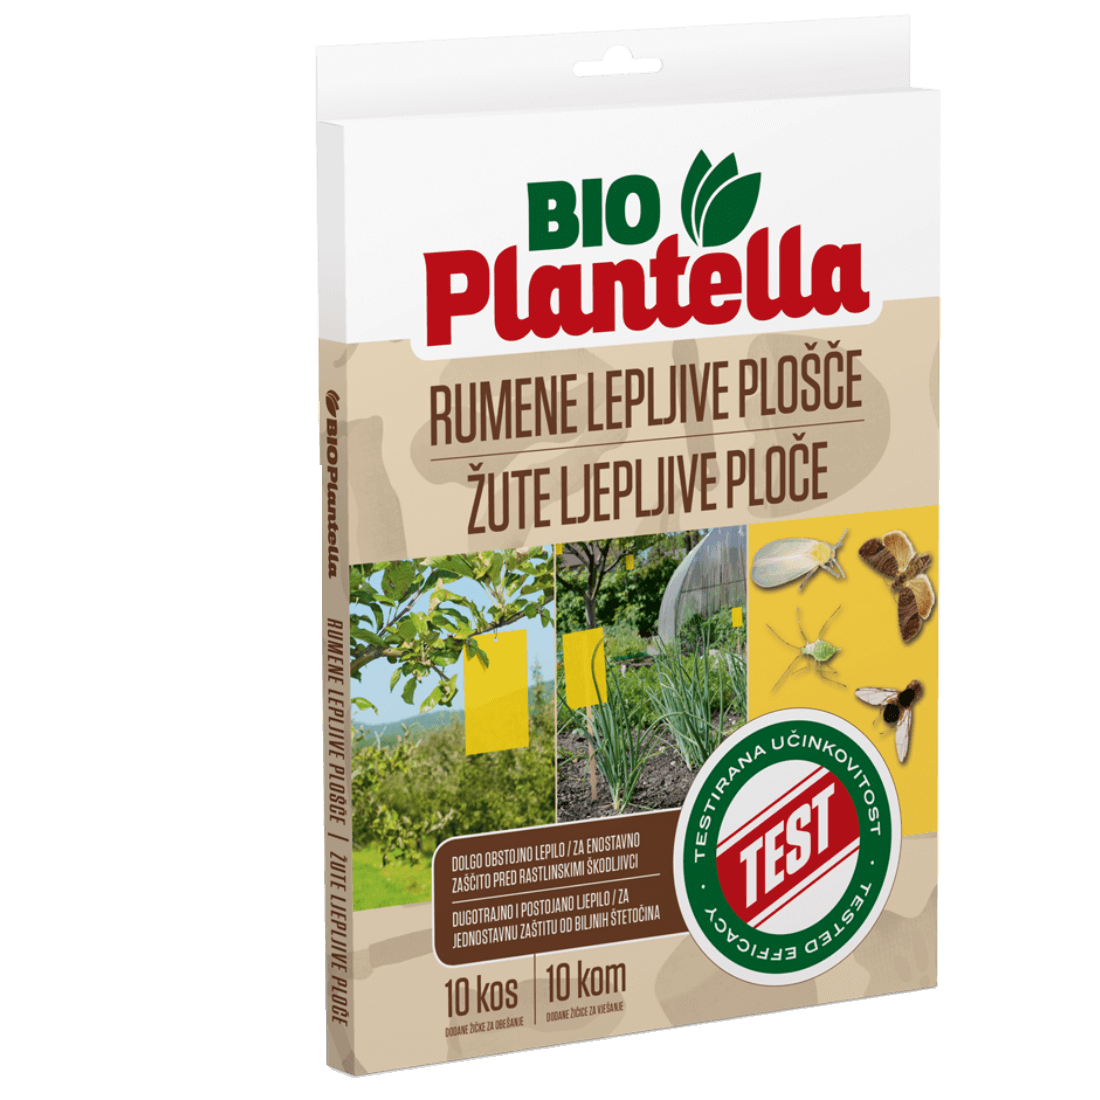 Bio-Plantella_Rumene-lepljive-plosce_10kom_SI-HR